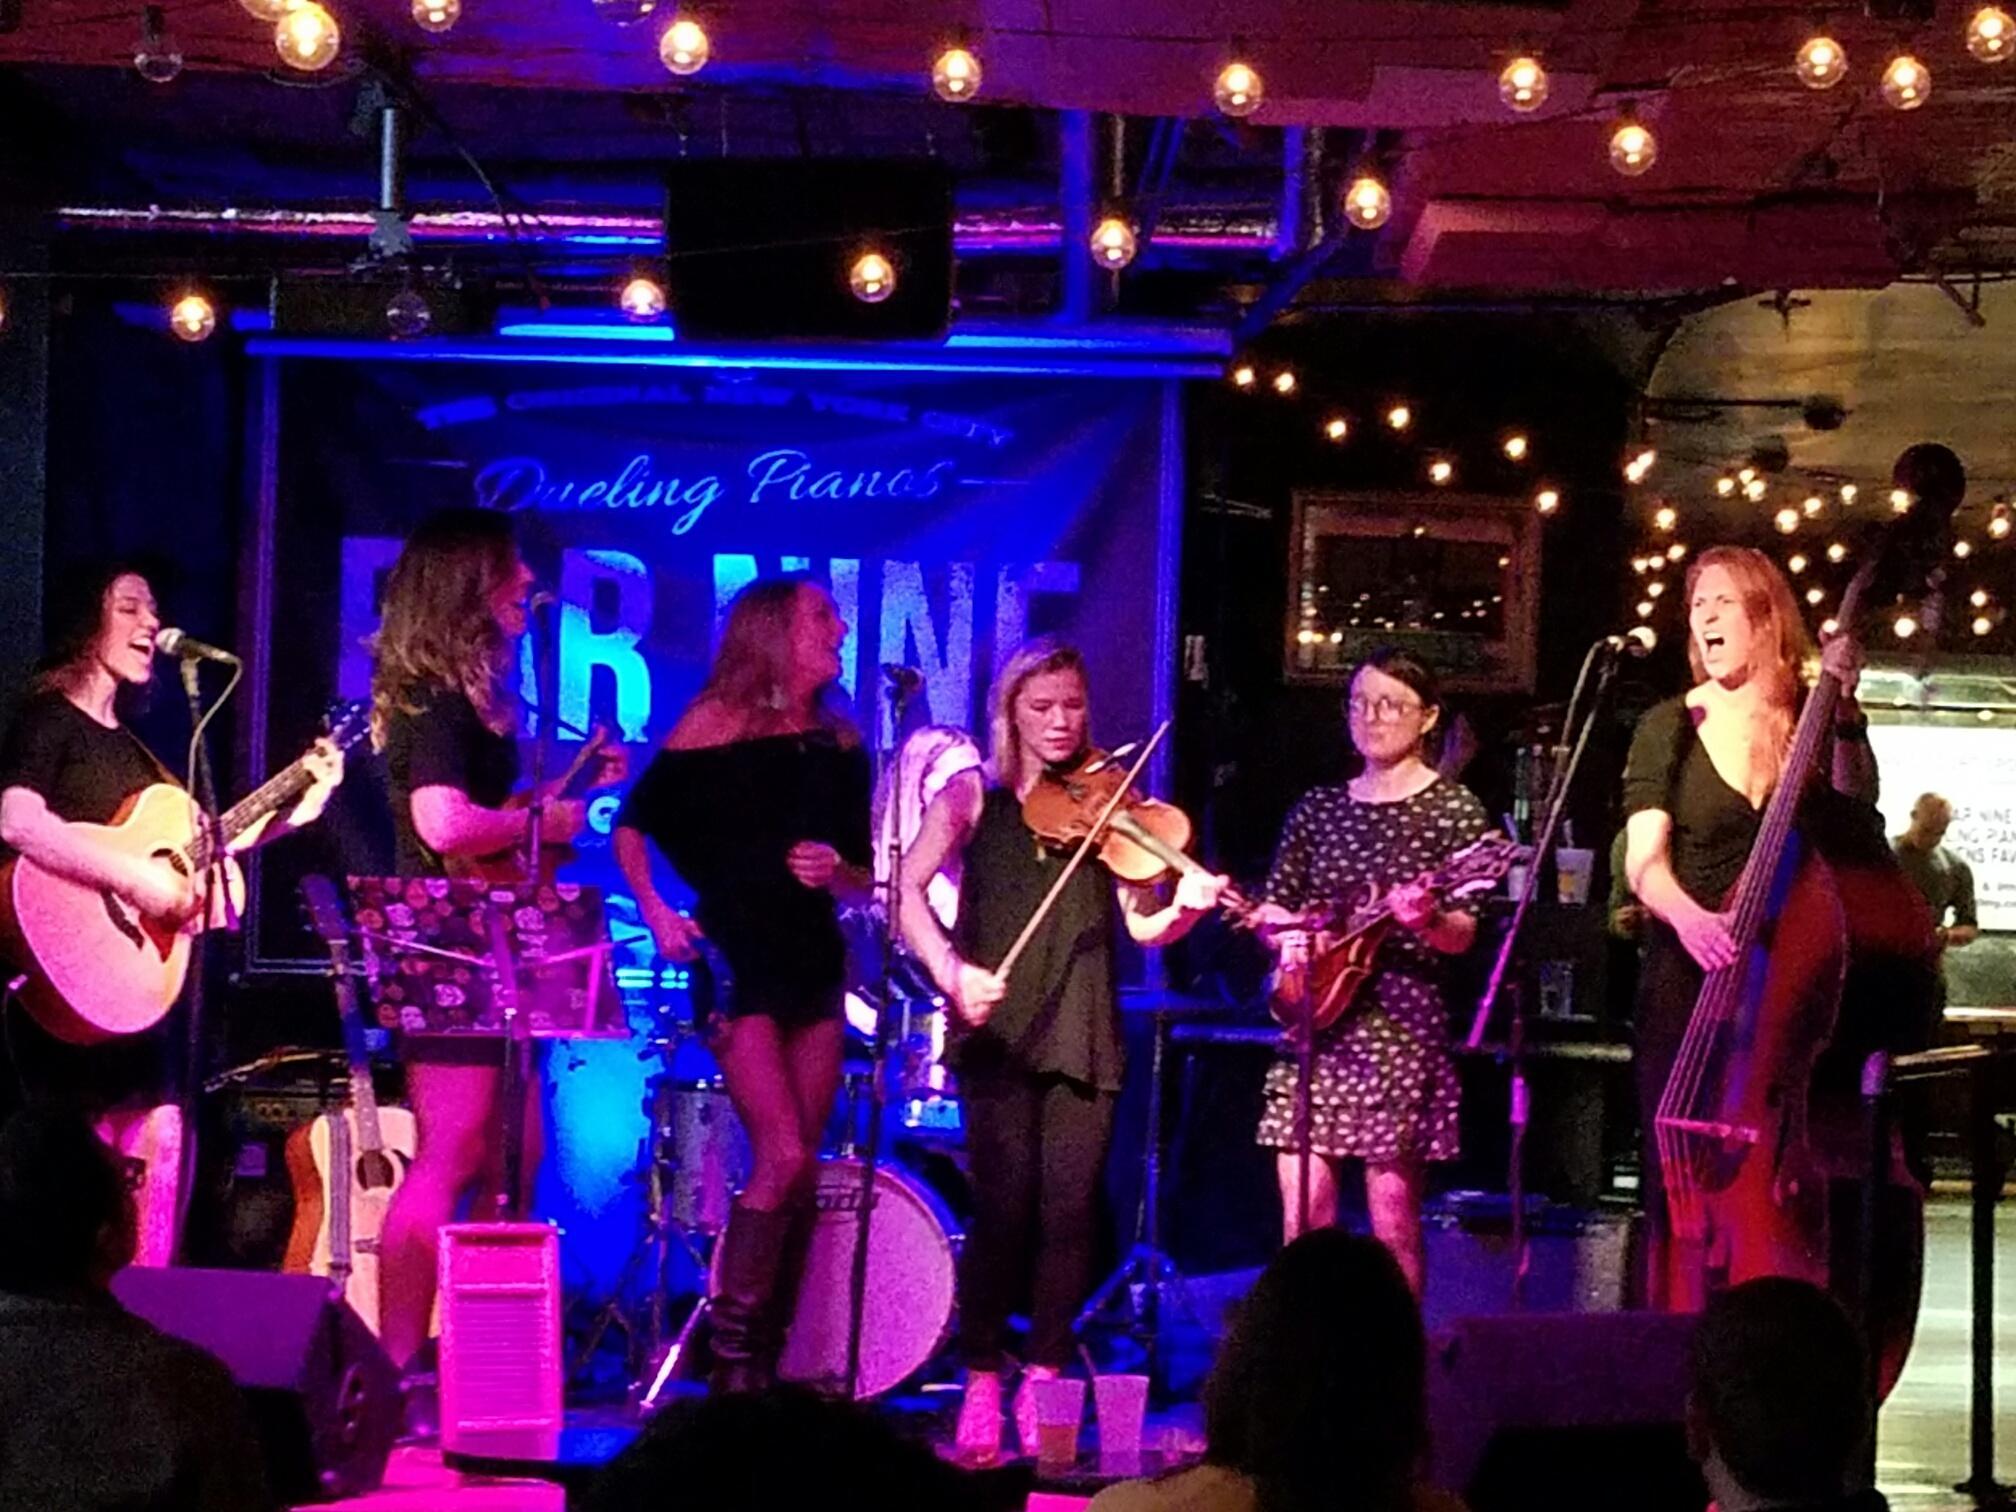 Bar 9 in Hell's Kitchen  with Aubrey Gallegos, Courtney Cowart, Susan O'Dea, Margaret Desiree-Mug, and Marcy McGuigan